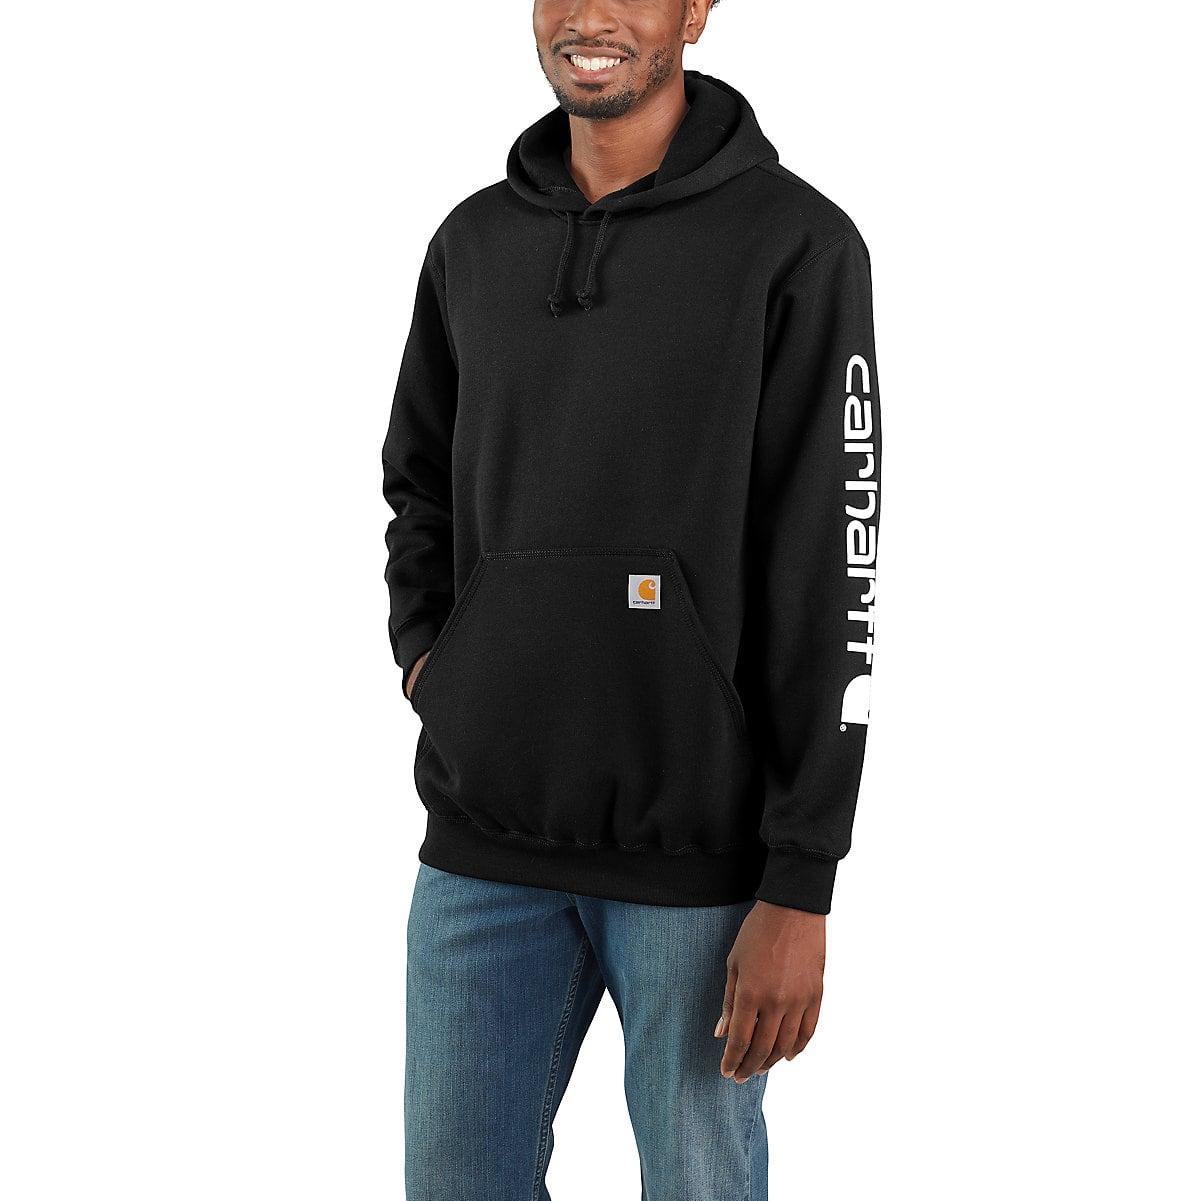 9294080c92b Men's Midweight Hooded Logo Sweatshirt K288 | Carhartt